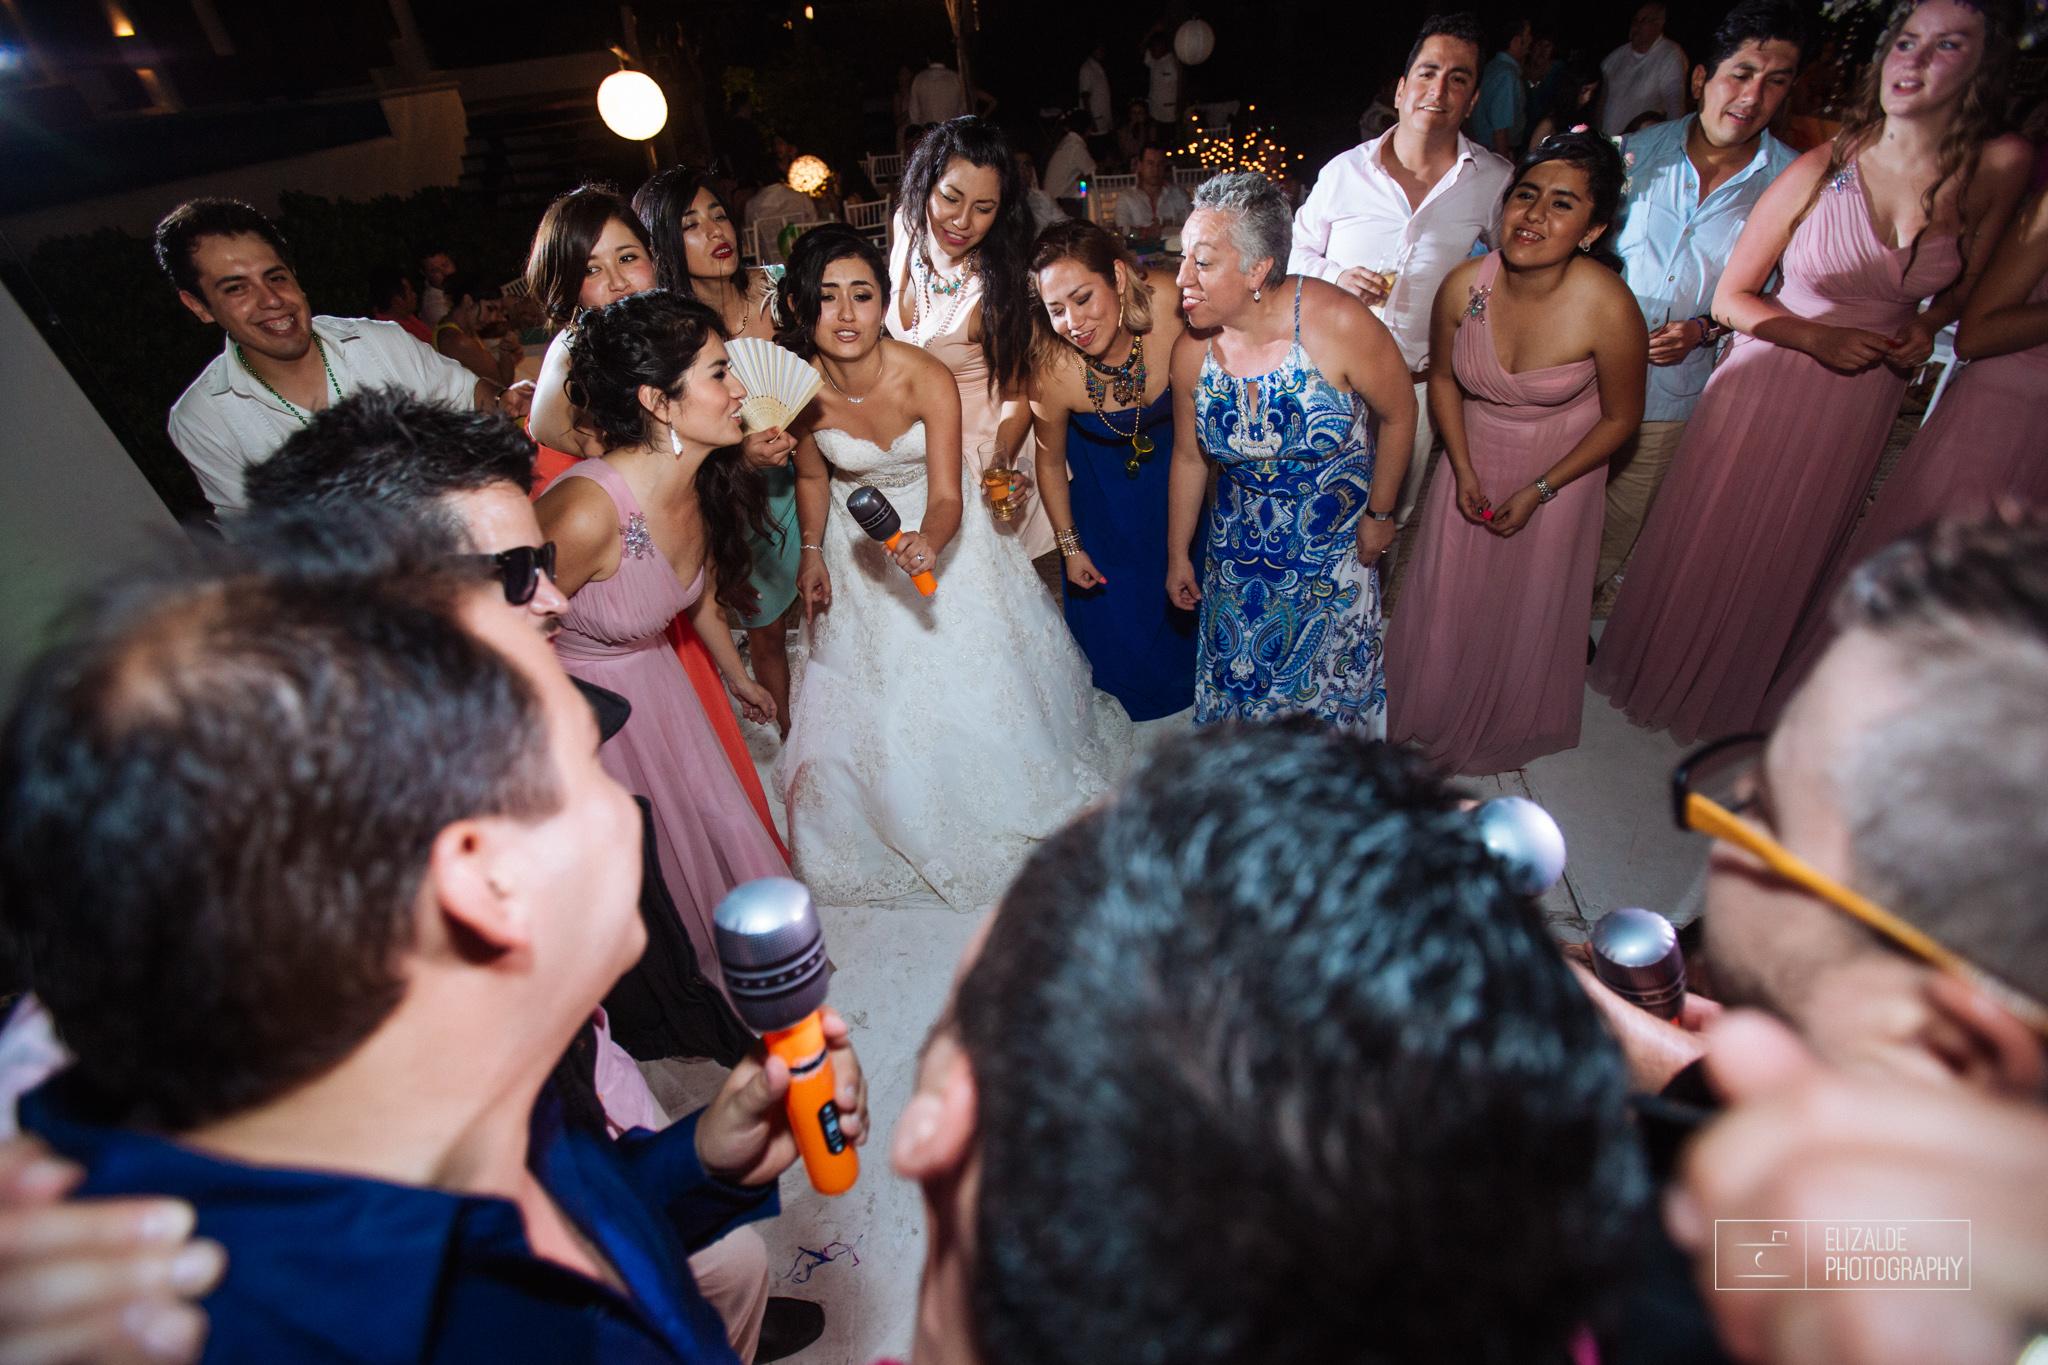 Pay and Ferran_Acapulco_Destination Wedding_Elizalde Photography-160.jpg